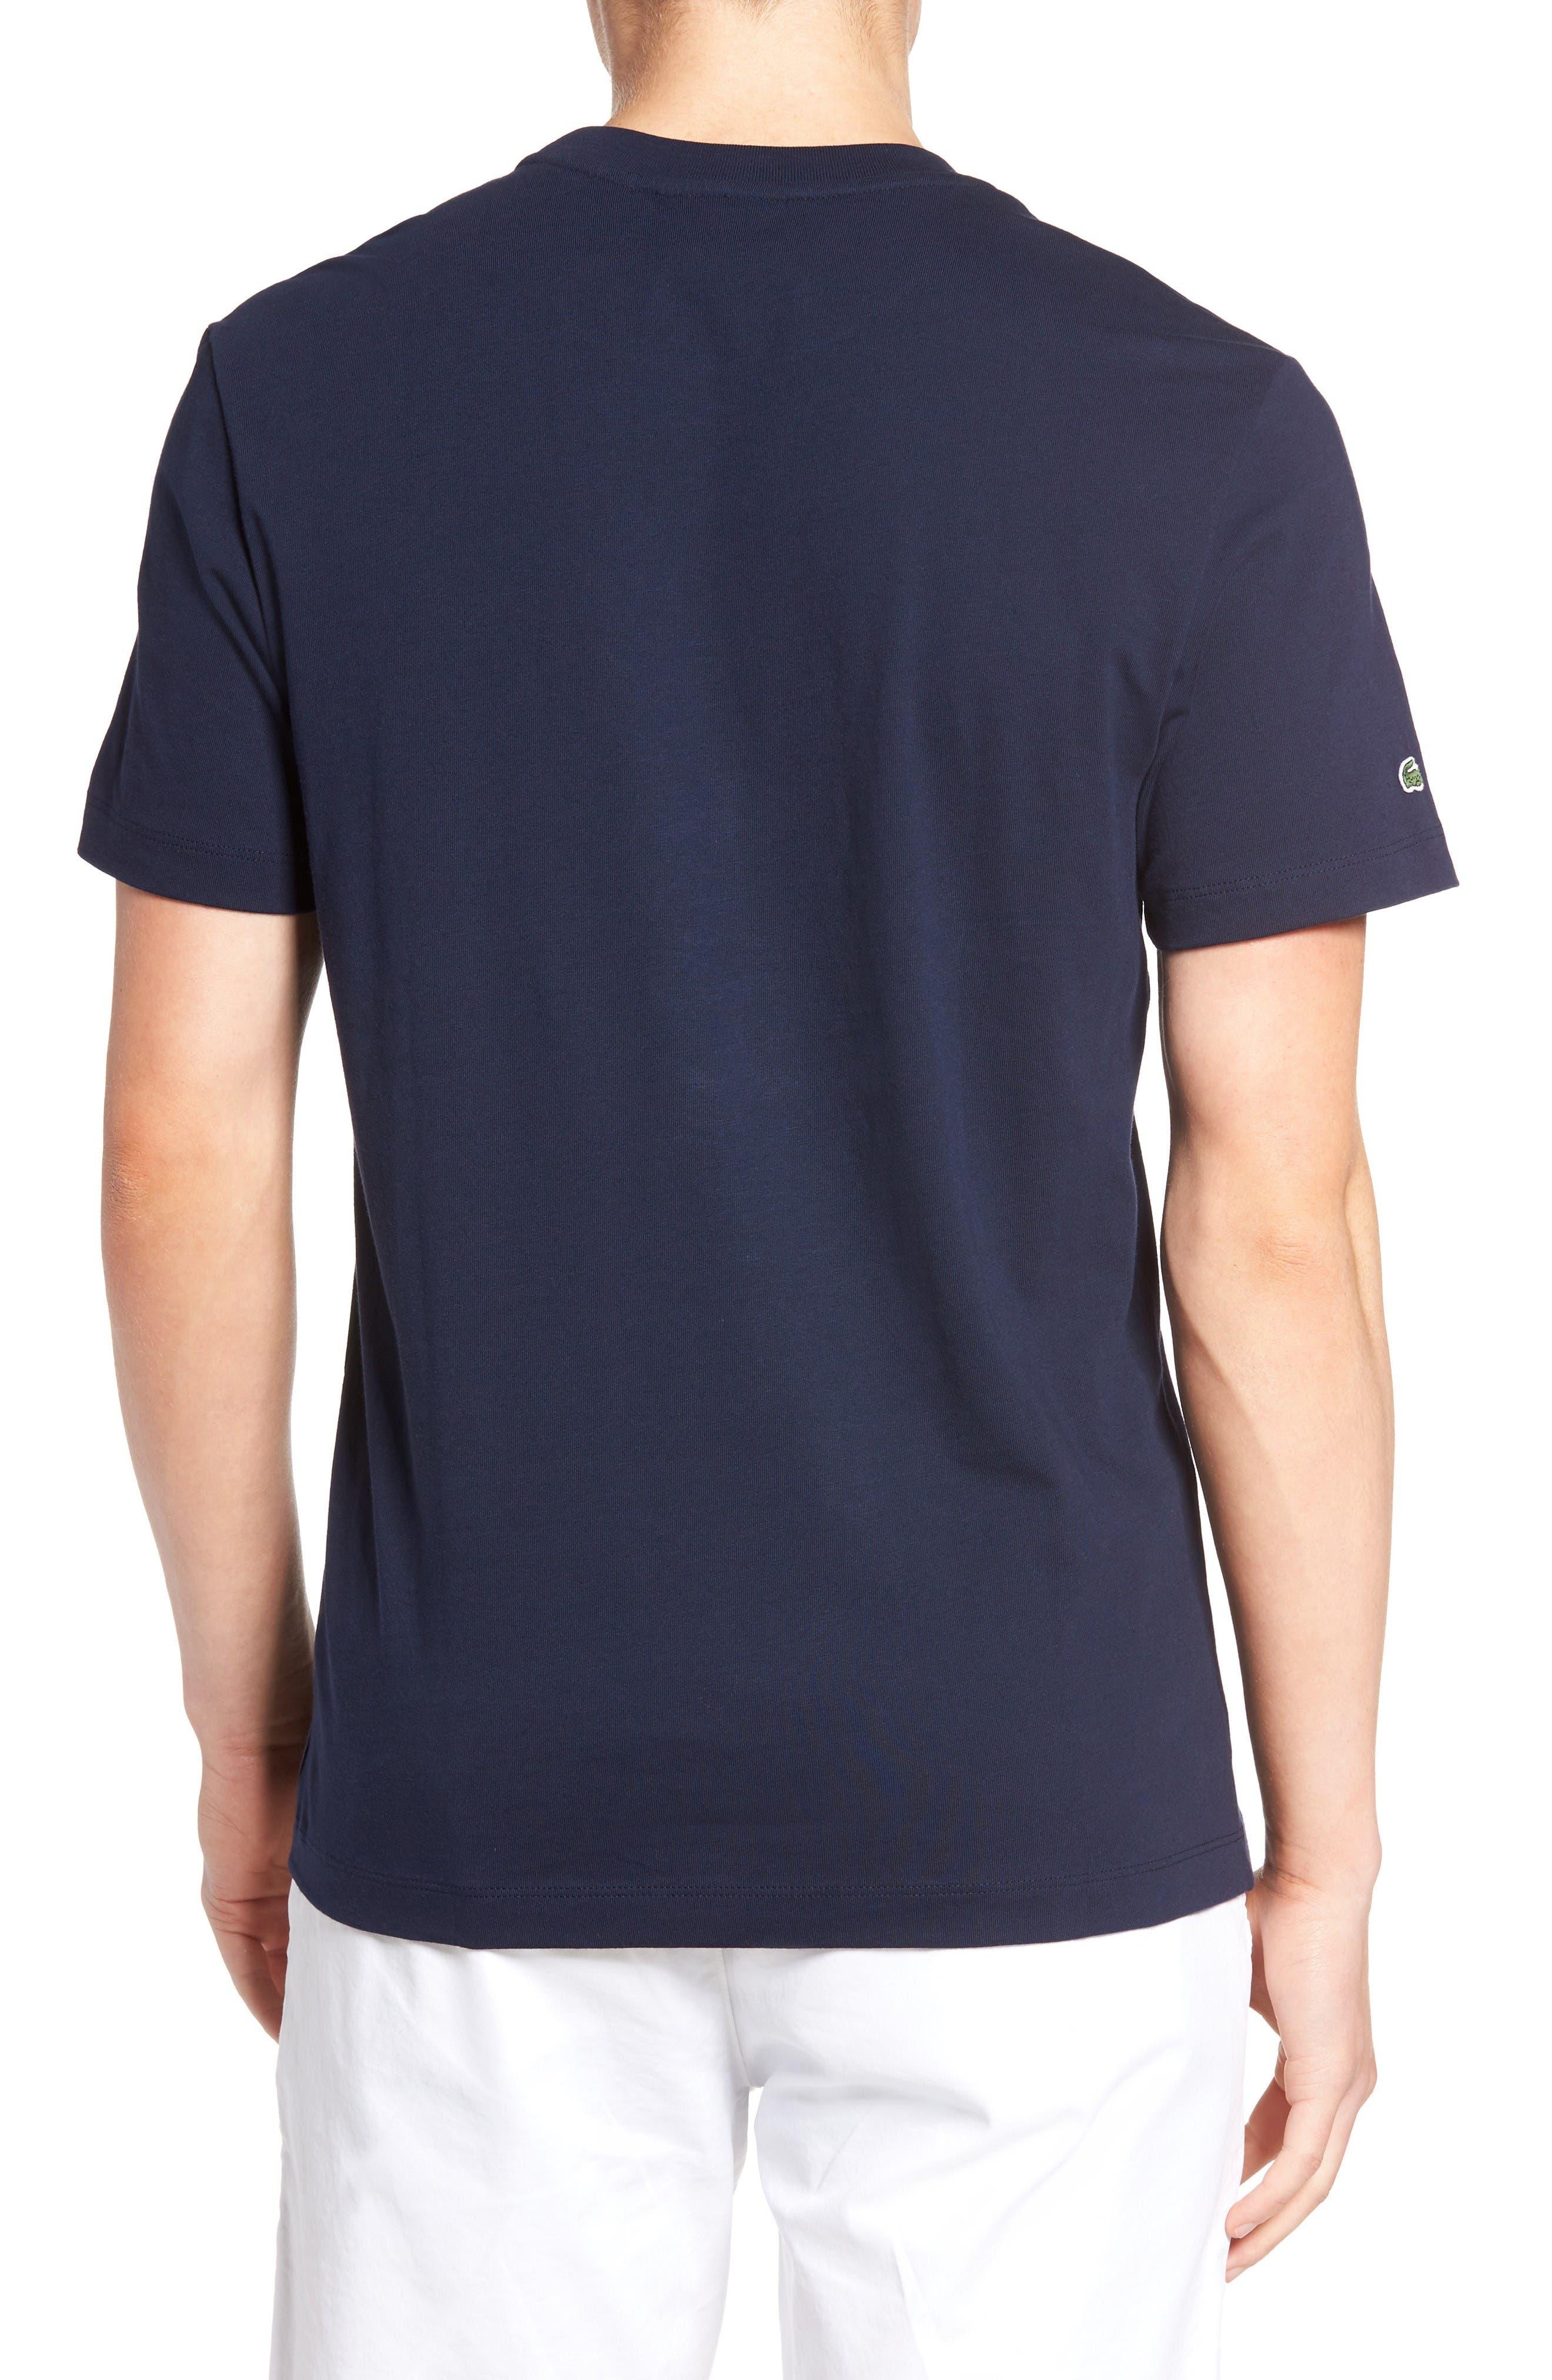 Alternate Image 2  - Lacoste 3D Logo Graphic T-Shirt